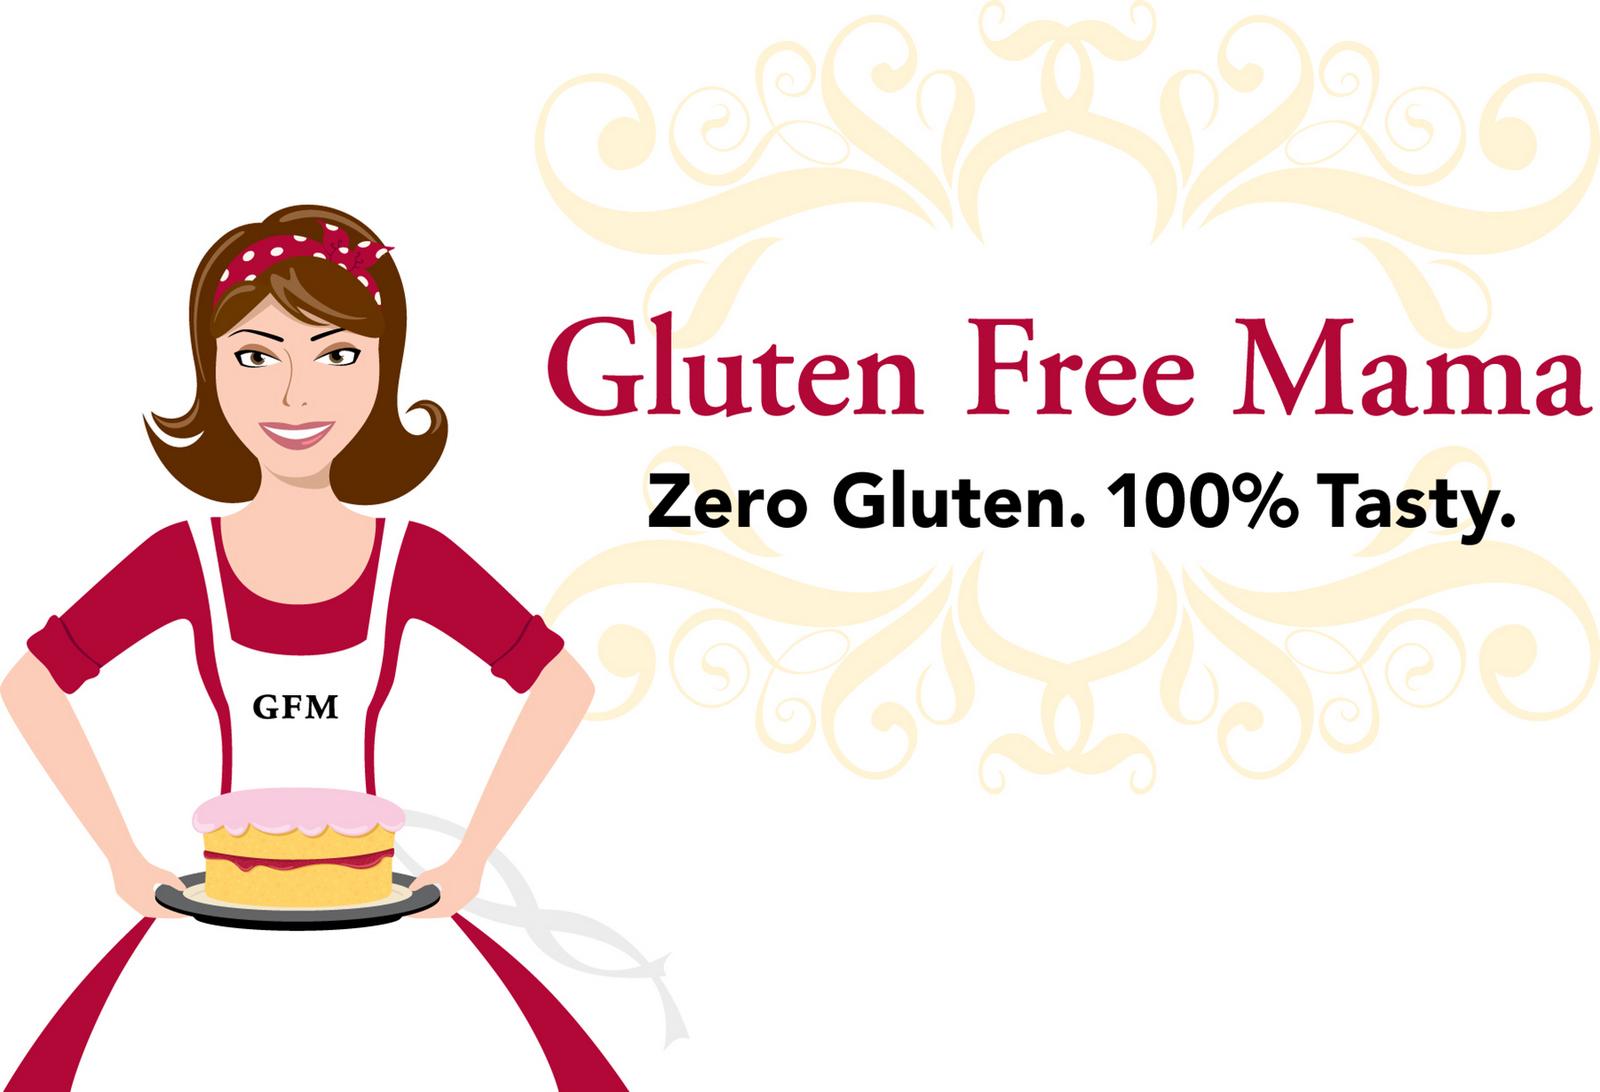 ... flour scott gluten free for the holidays a blogging event gluten free